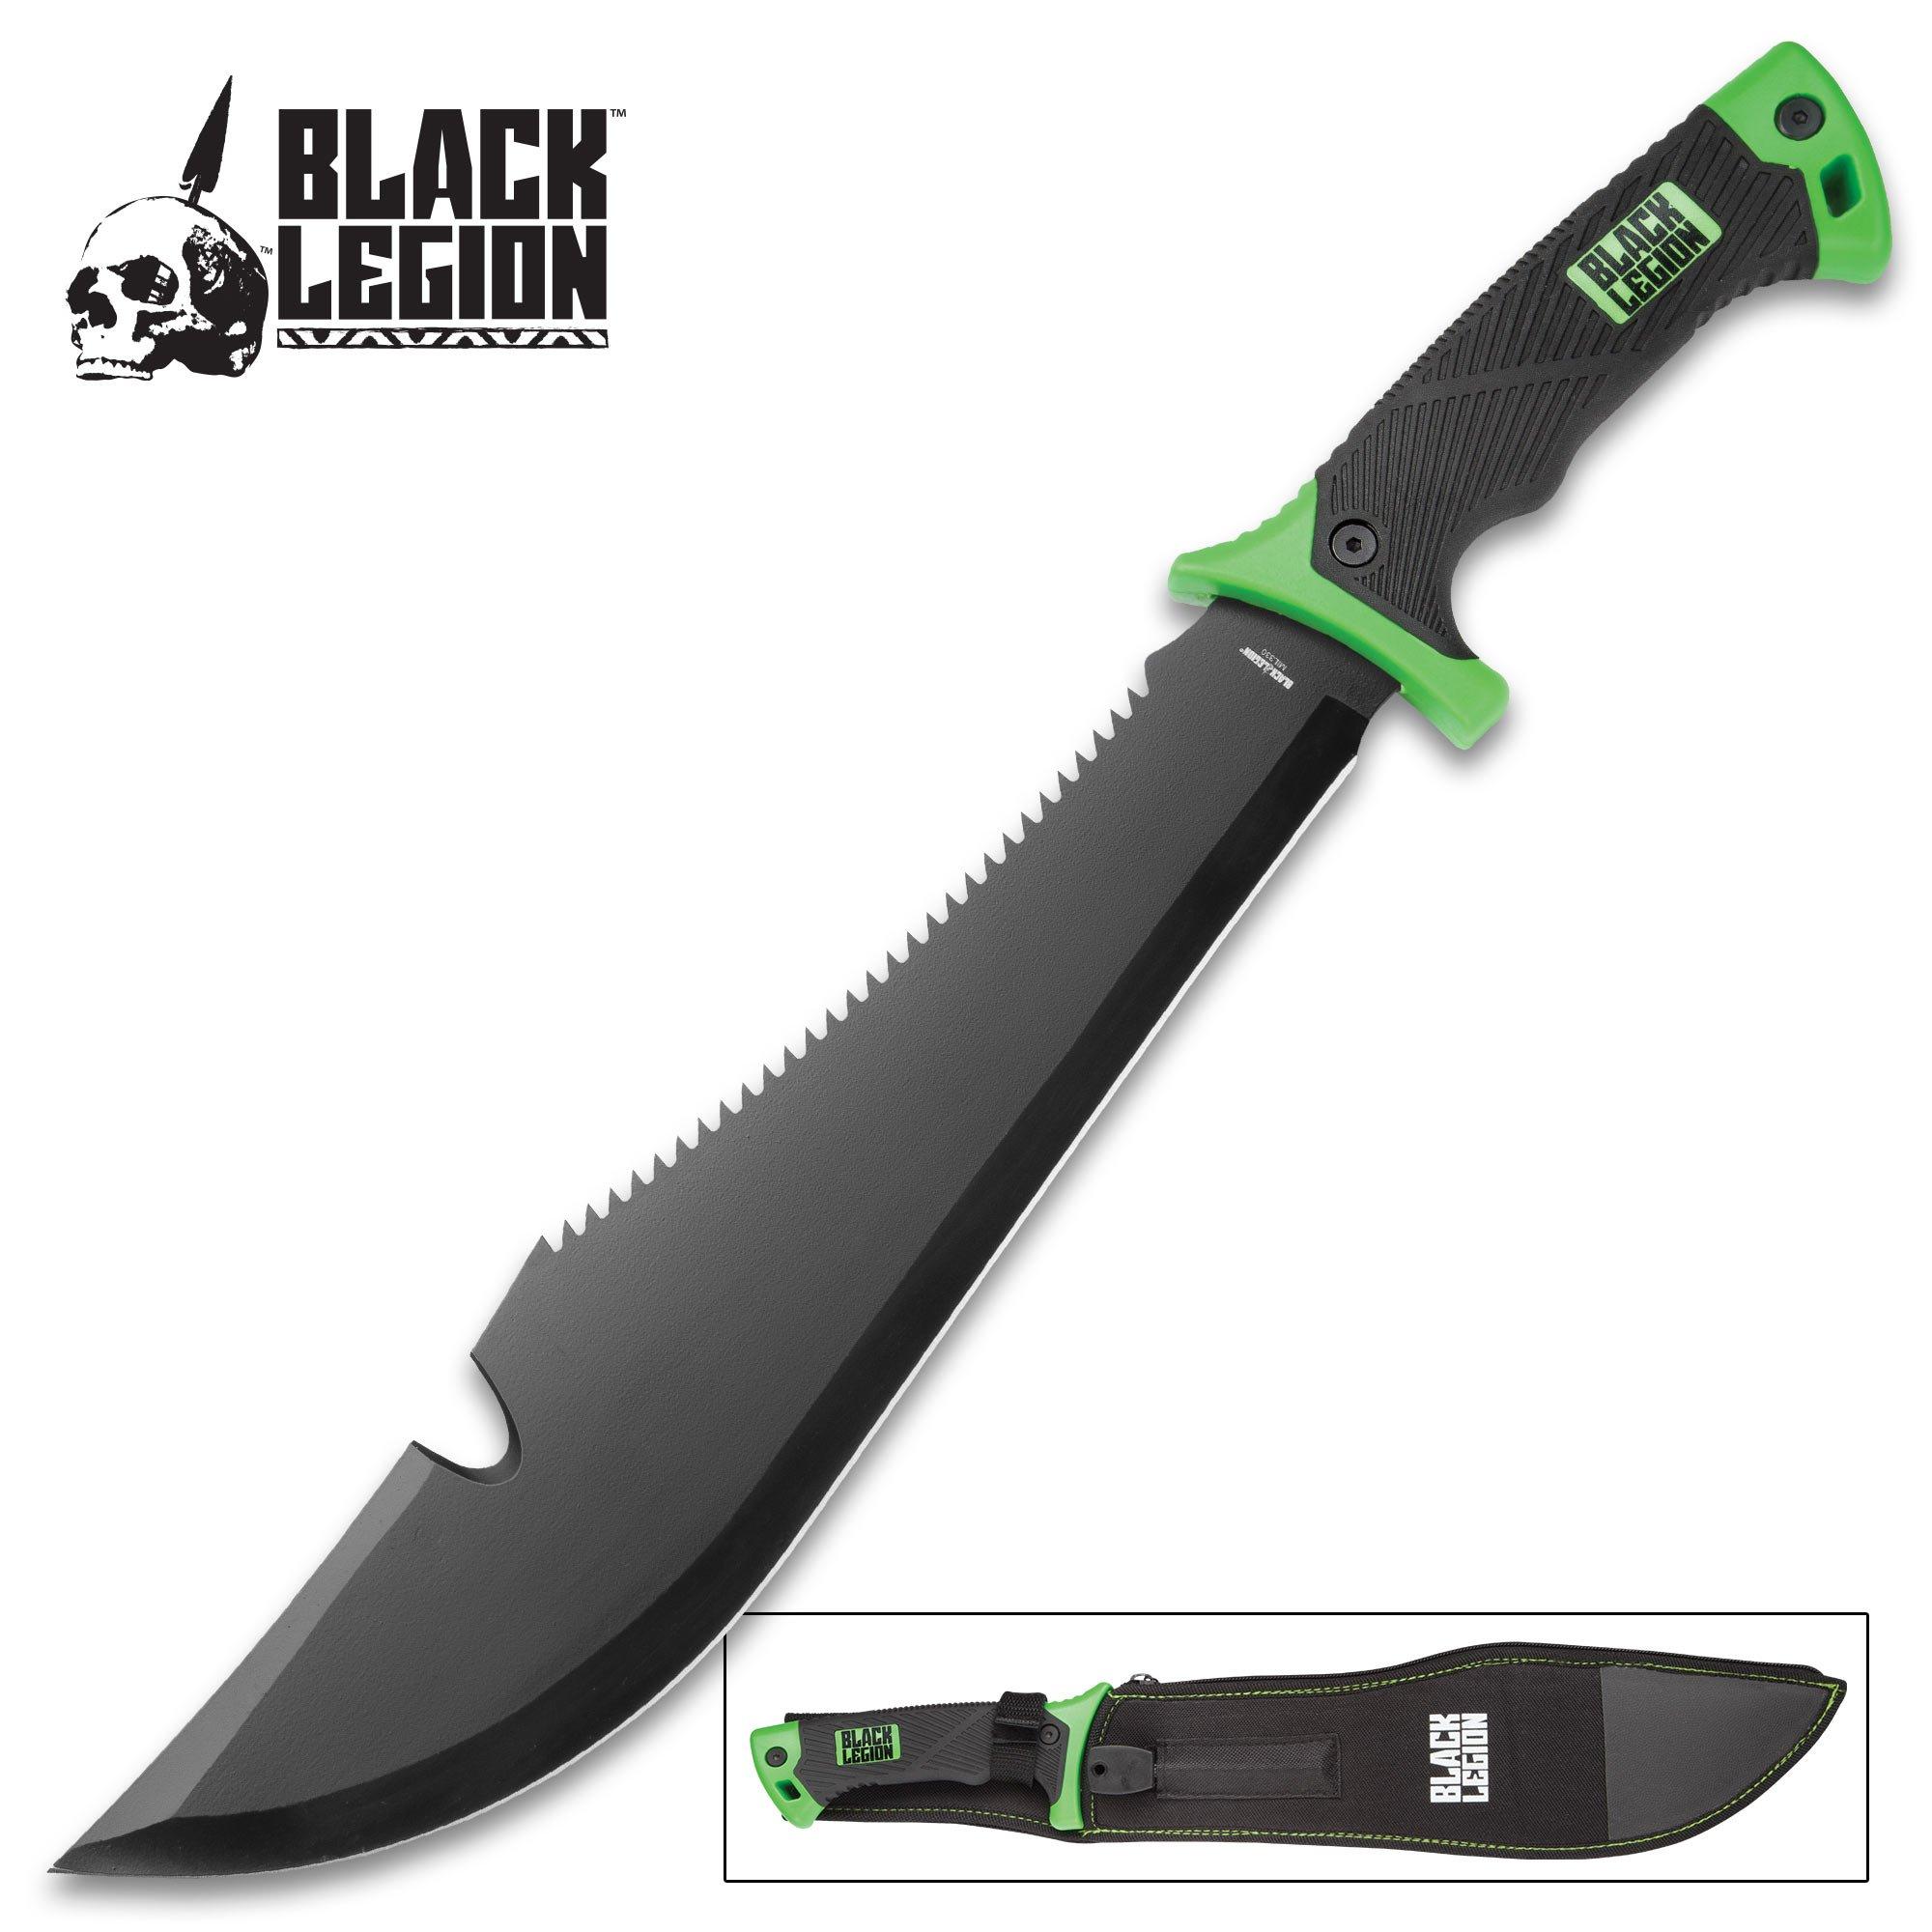 Black Legion Jungle Hunter Bush Machete with Nylon Sheath | Sawback Serrations | Fire Starter